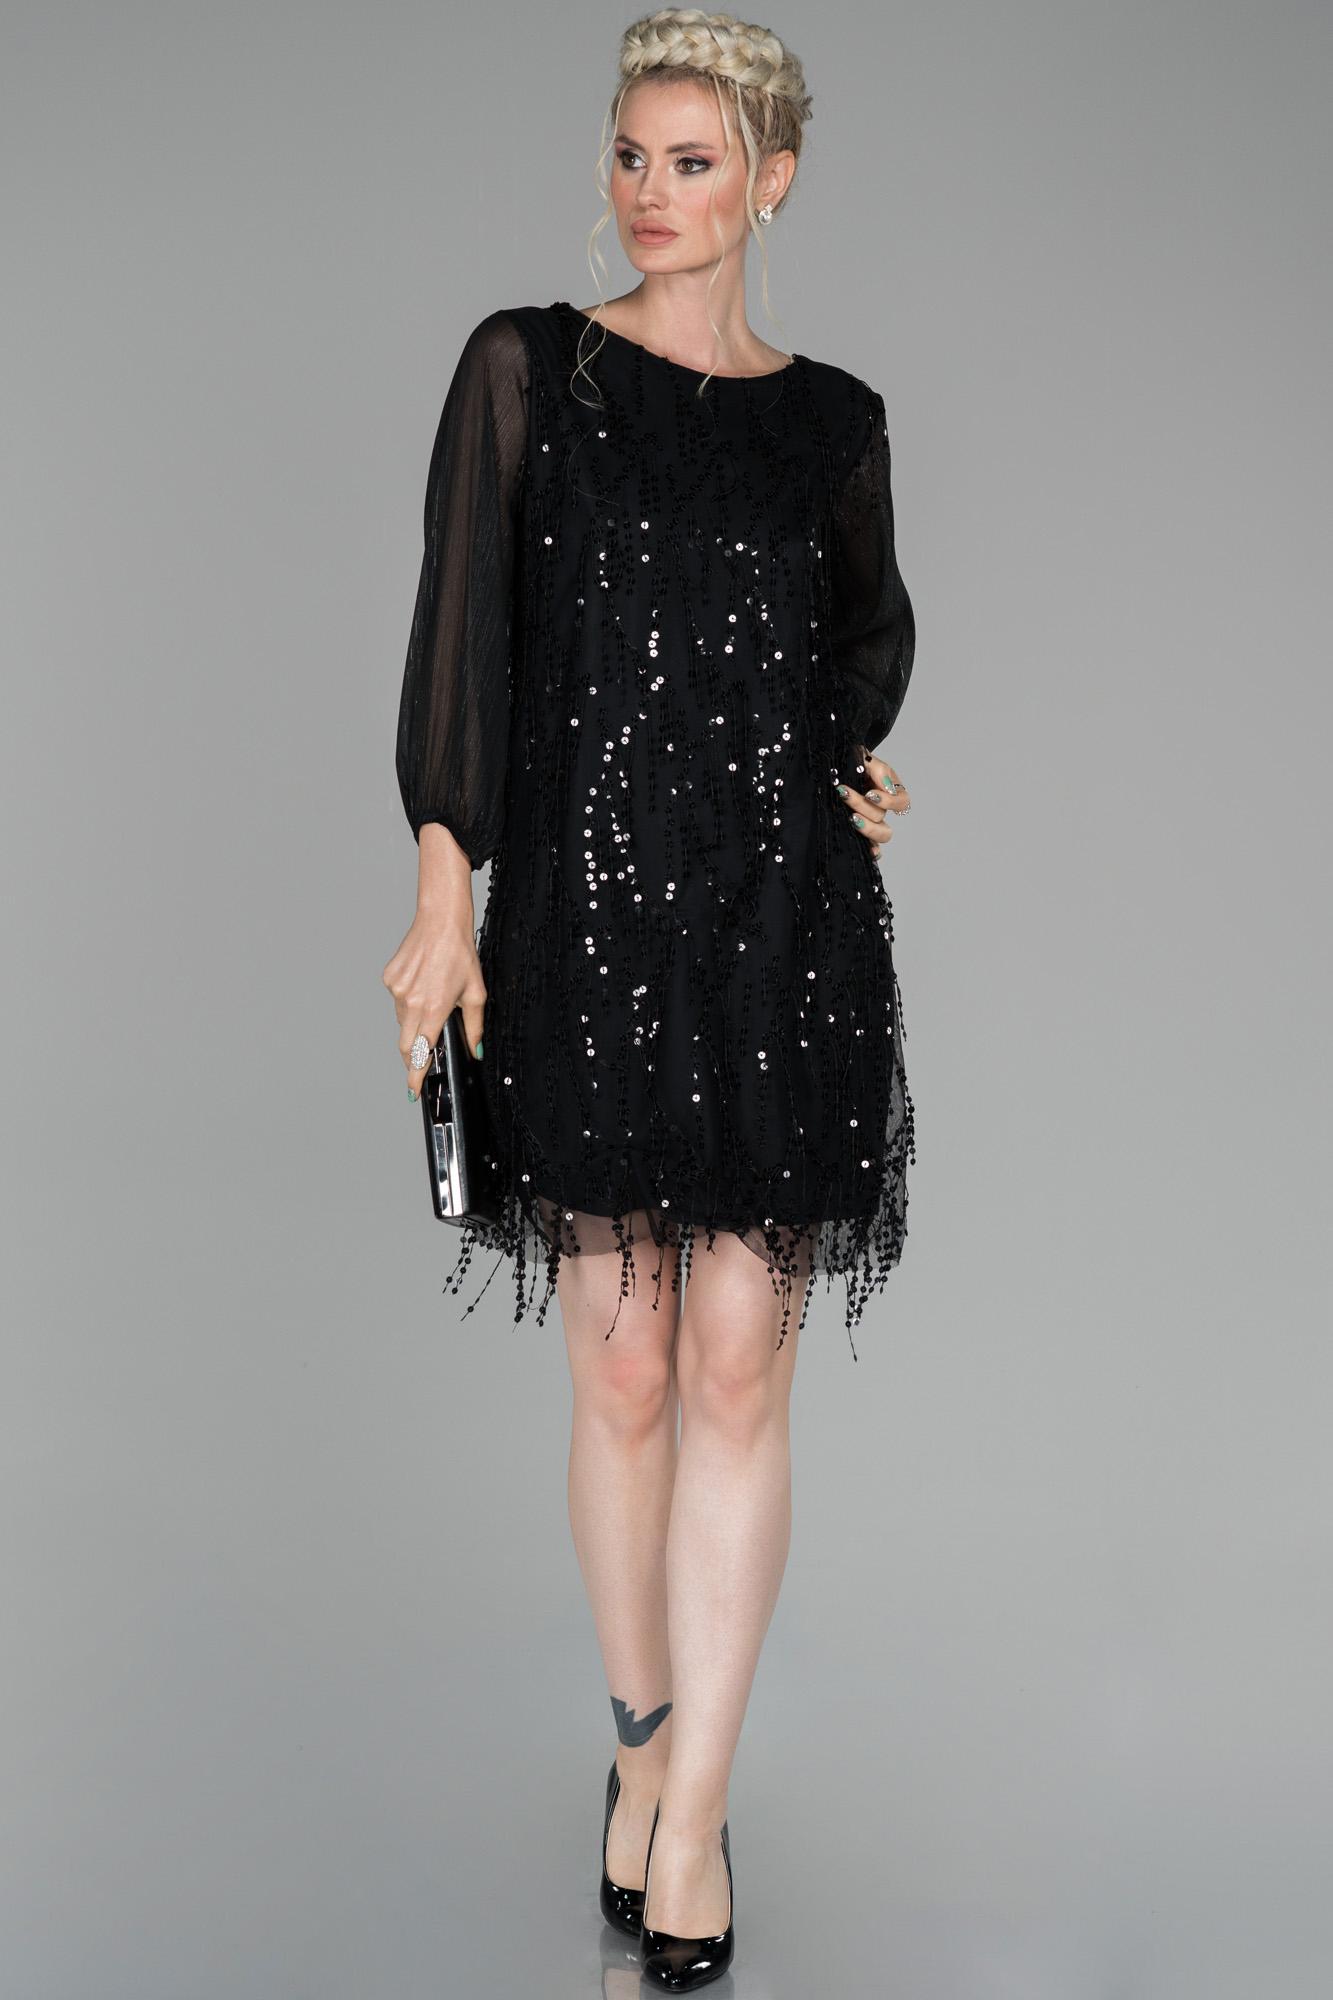 Siyah Mini Pul Payet Işlemeli Davet Elbisesi